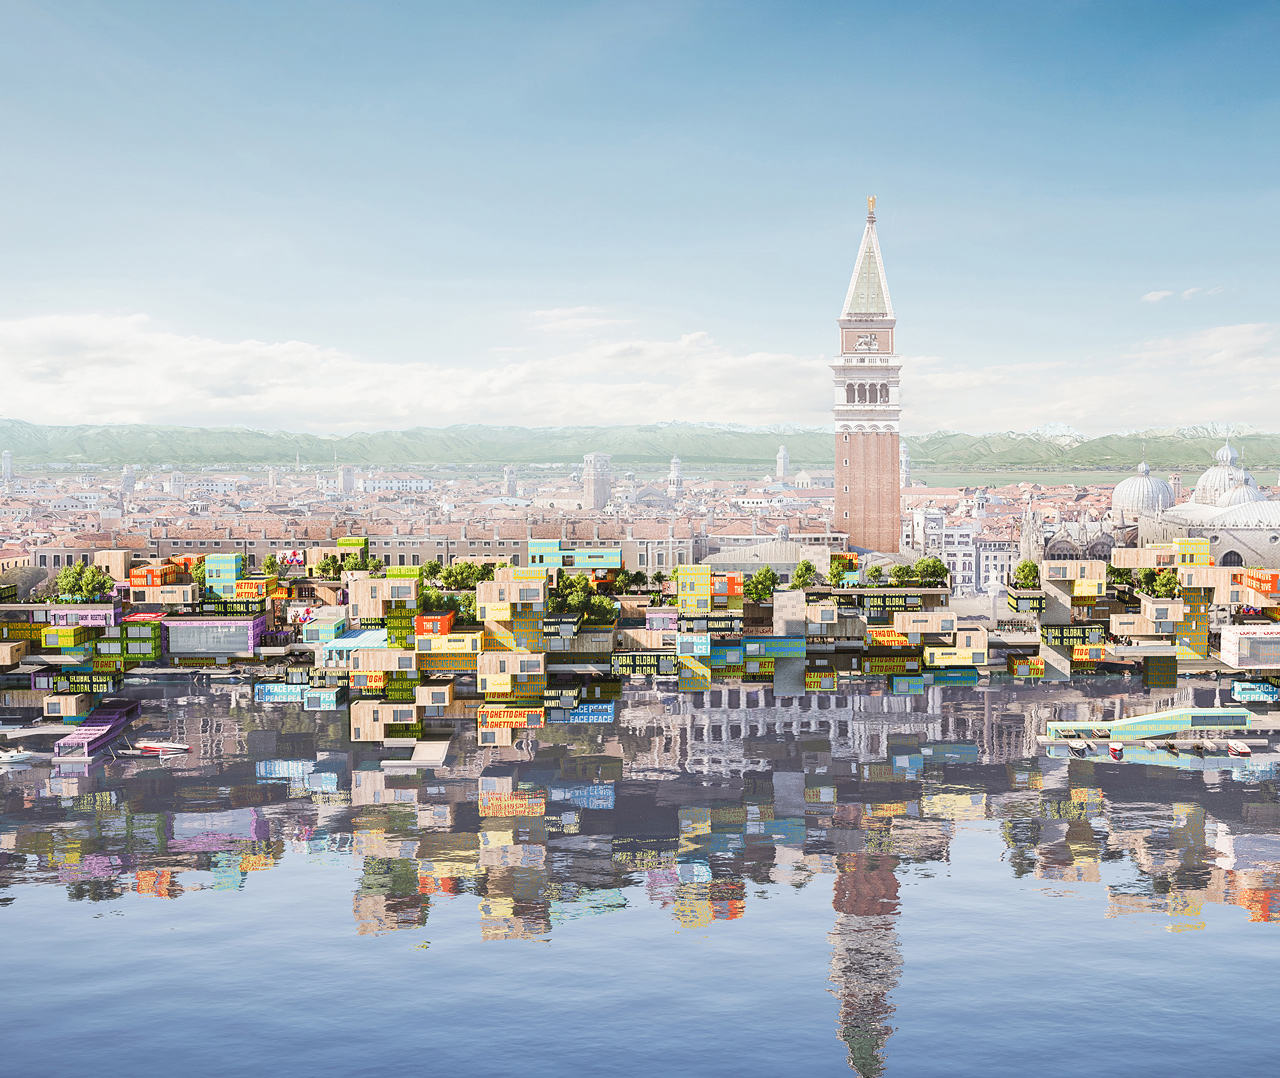 GHETTO island – Piazza San Marco